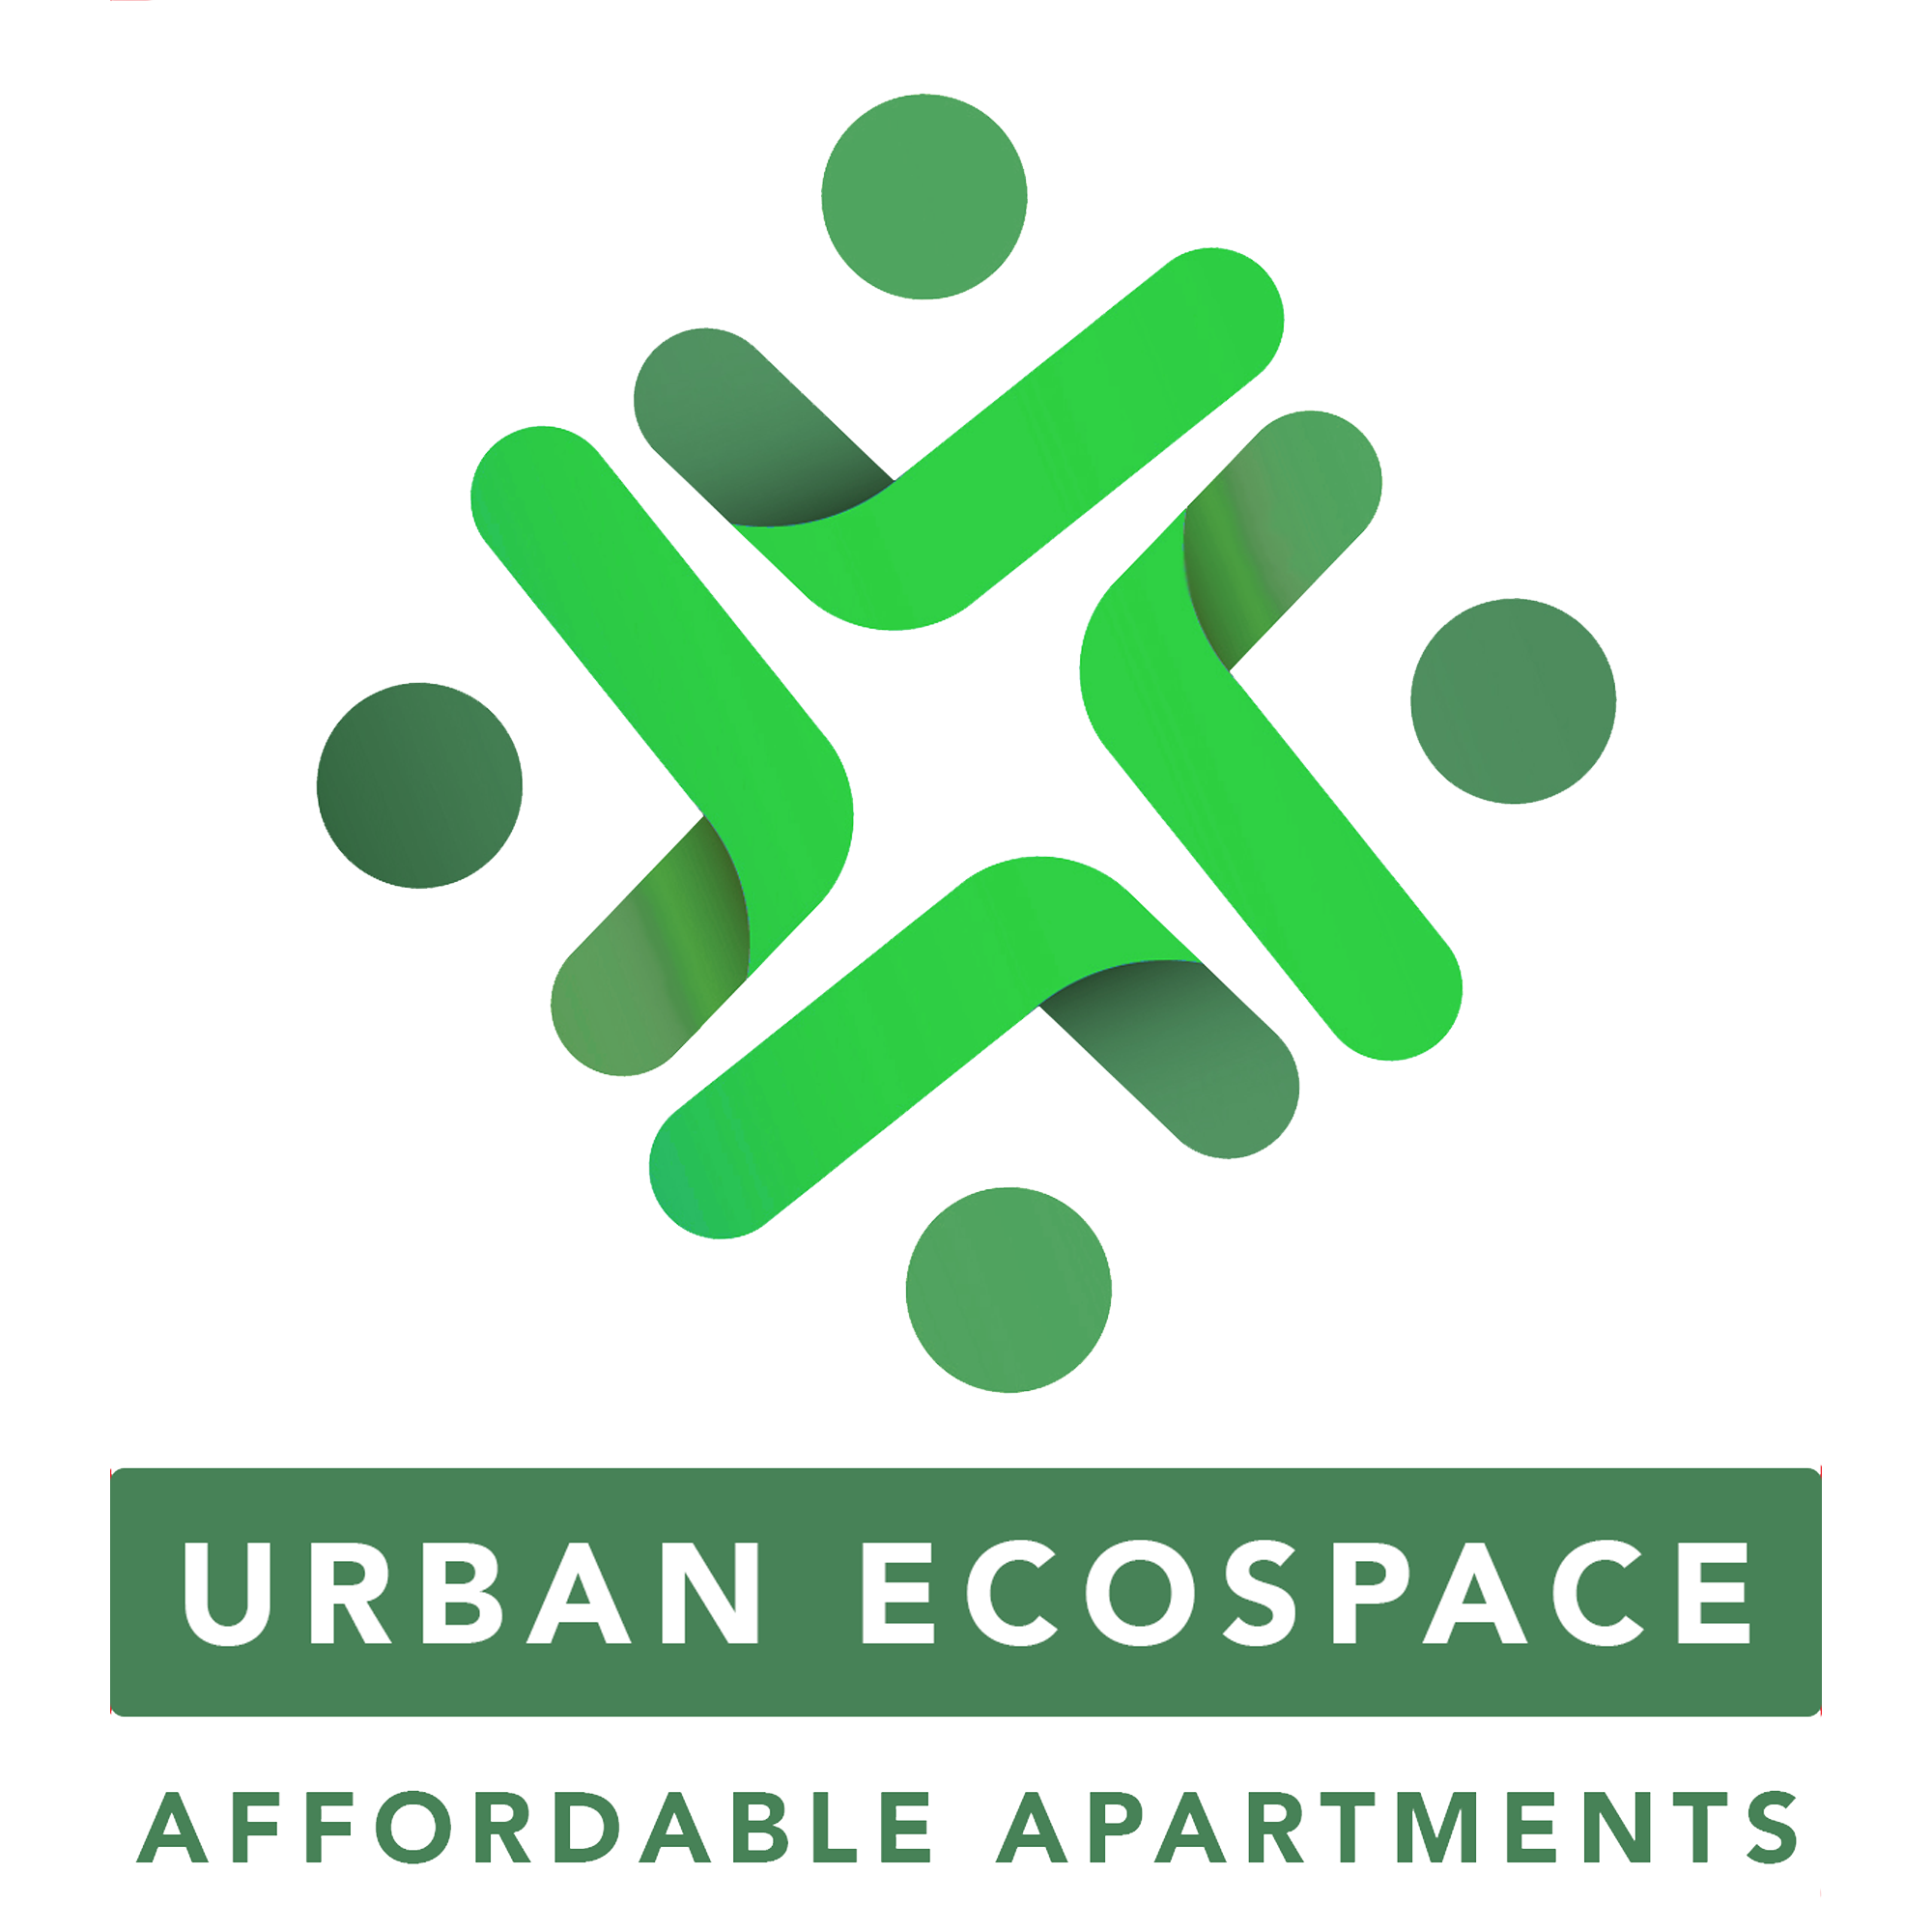 Urban Ecospace